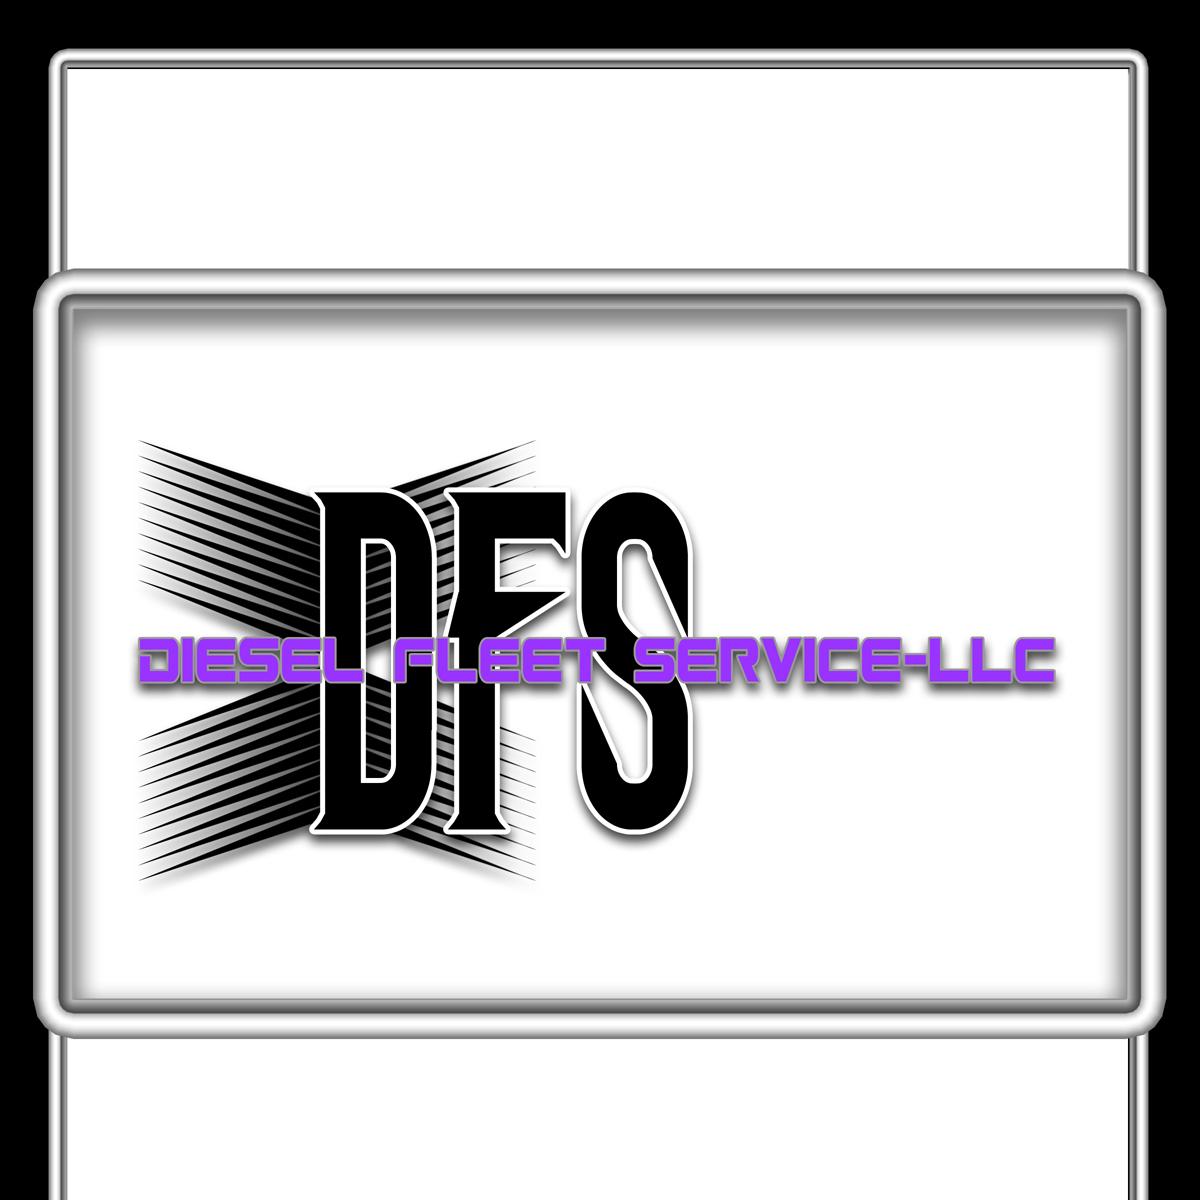 Logo Design by MITUCA ANDREI - Entry No. 4 in the Logo Design Contest Artistic Logo Design for Diesel Fleet Service, LLC.